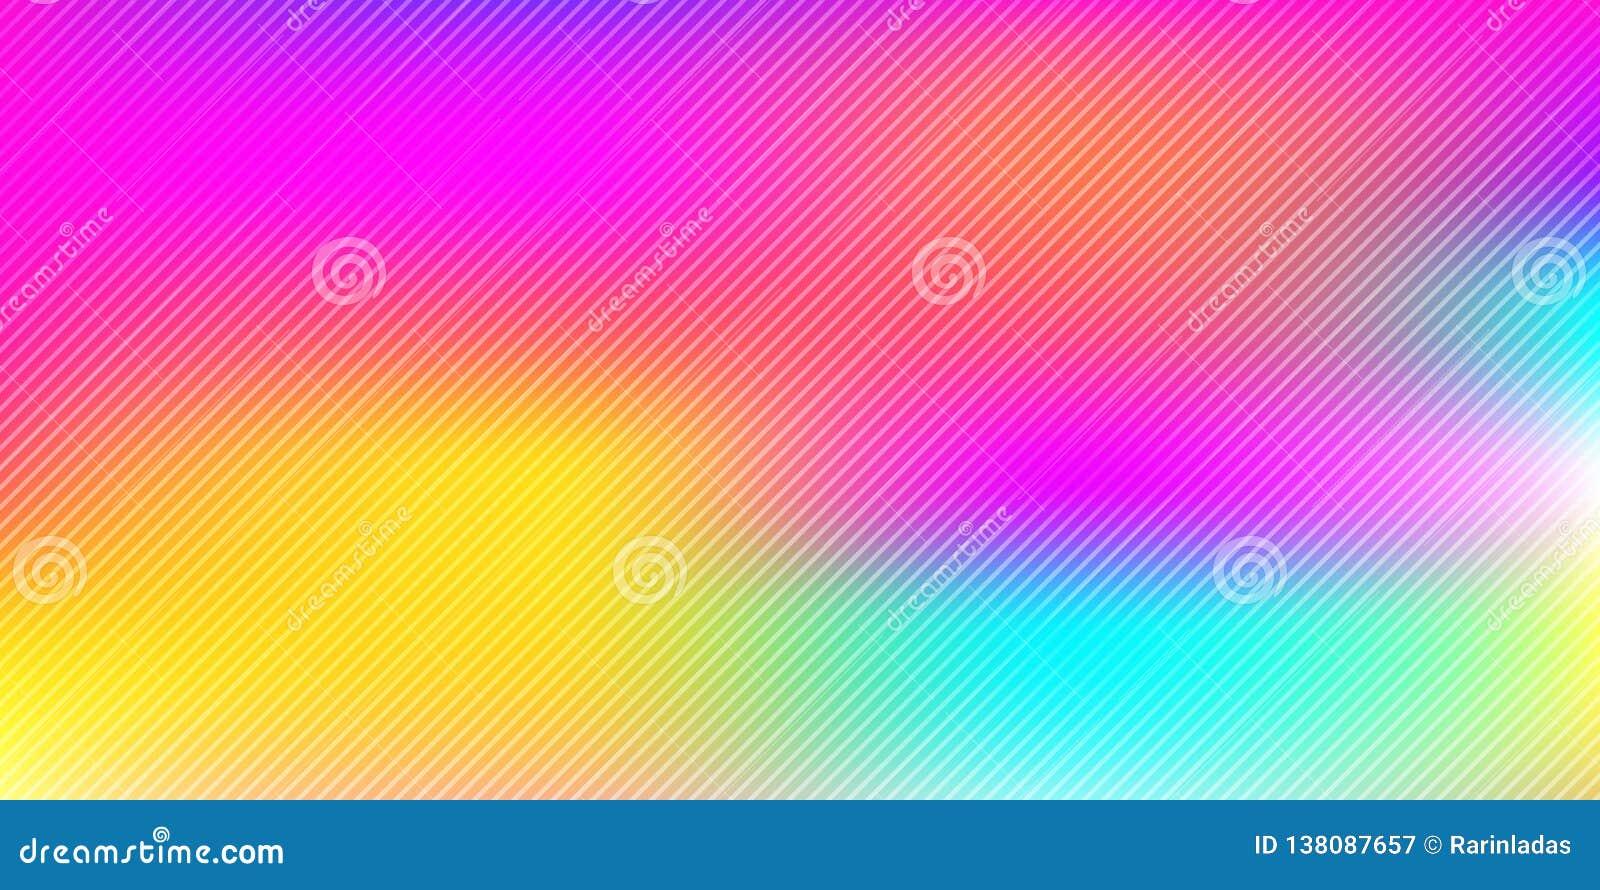 Fondo vago arcobaleno variopinto astratto con le linee diagonali struttura del modello